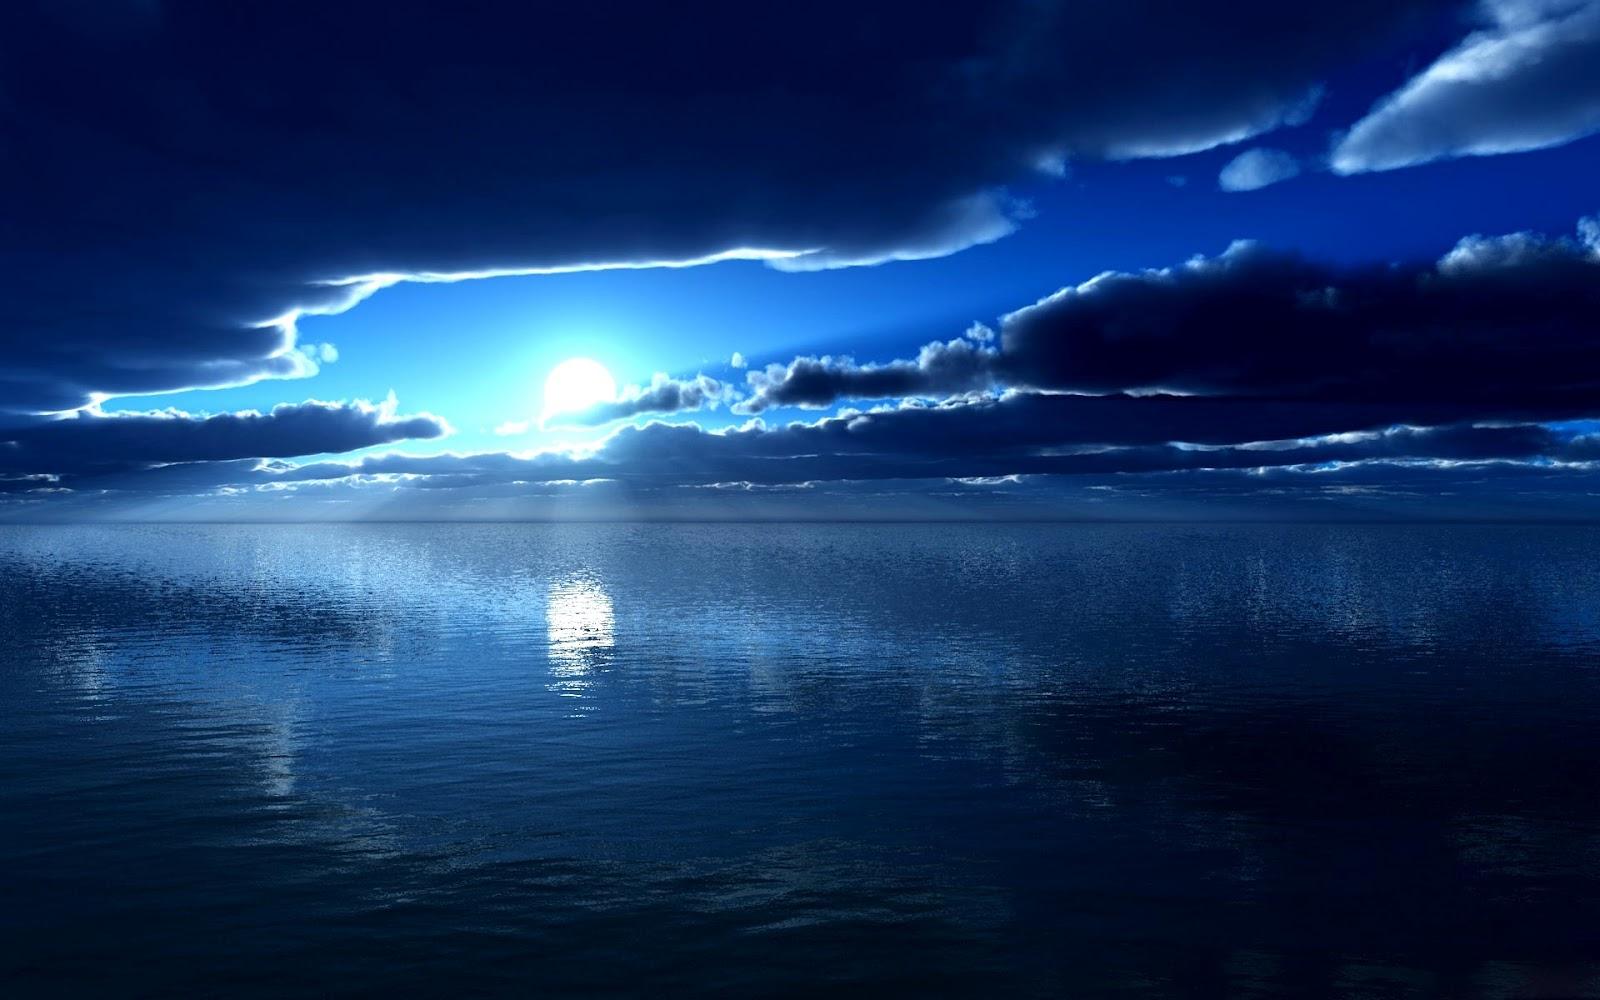 Beautiful Night Sky WallpaperWallpaper Background